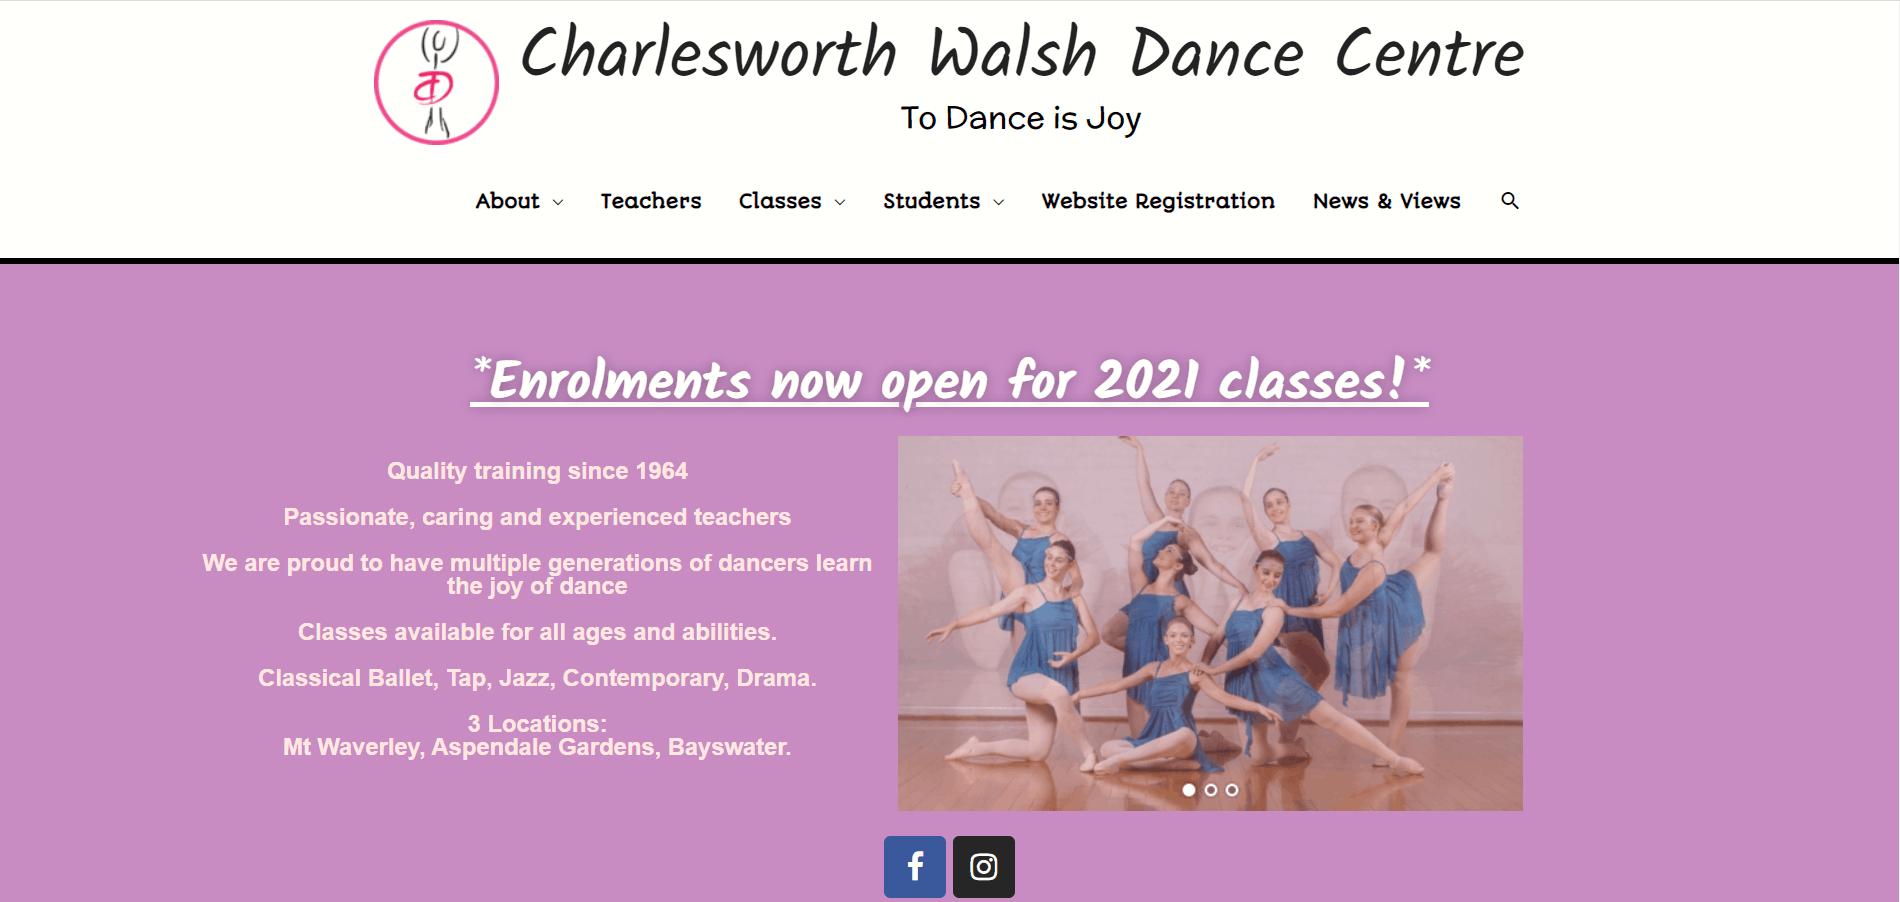 Charlesworth Walsh Dance Centre